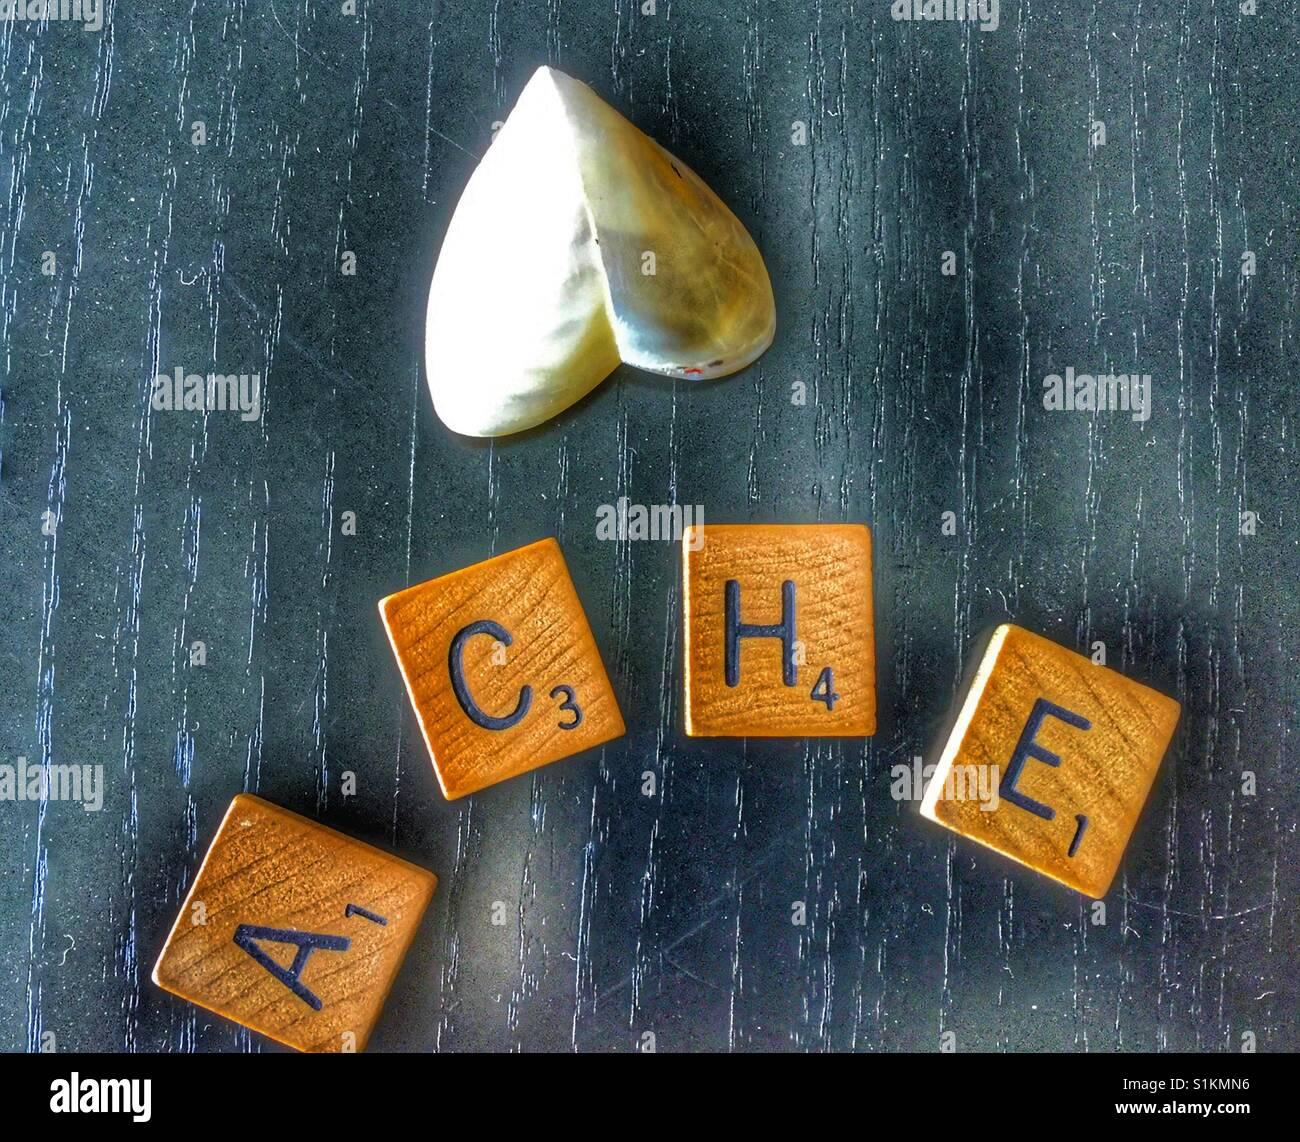 Le chagrin. Photo Stock